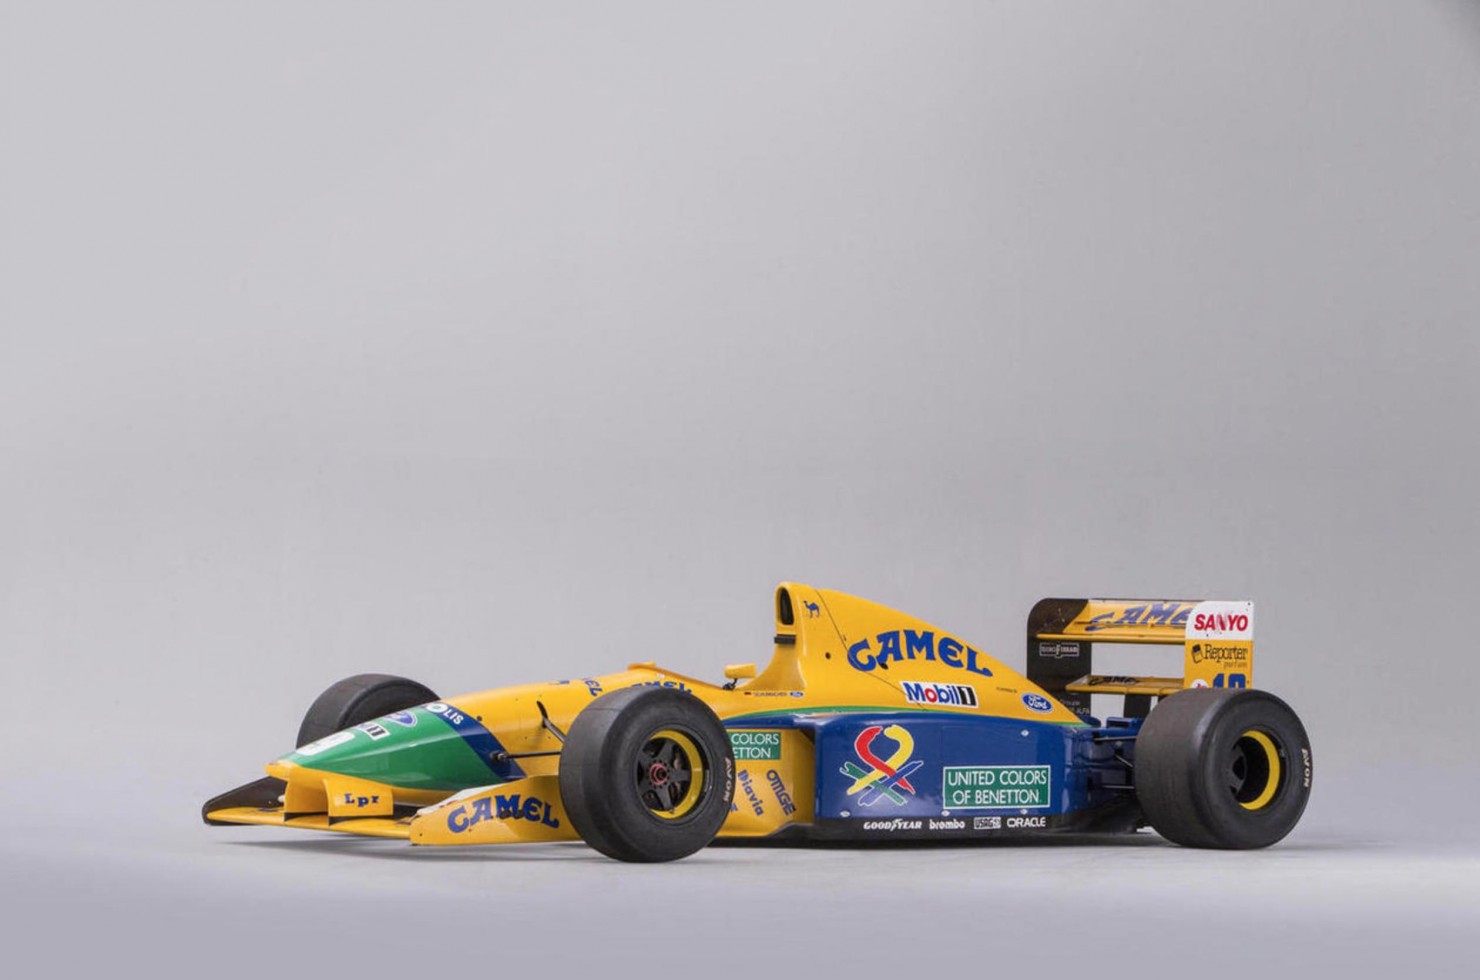 Ex-Schumacher Benetton Formula 1 Car